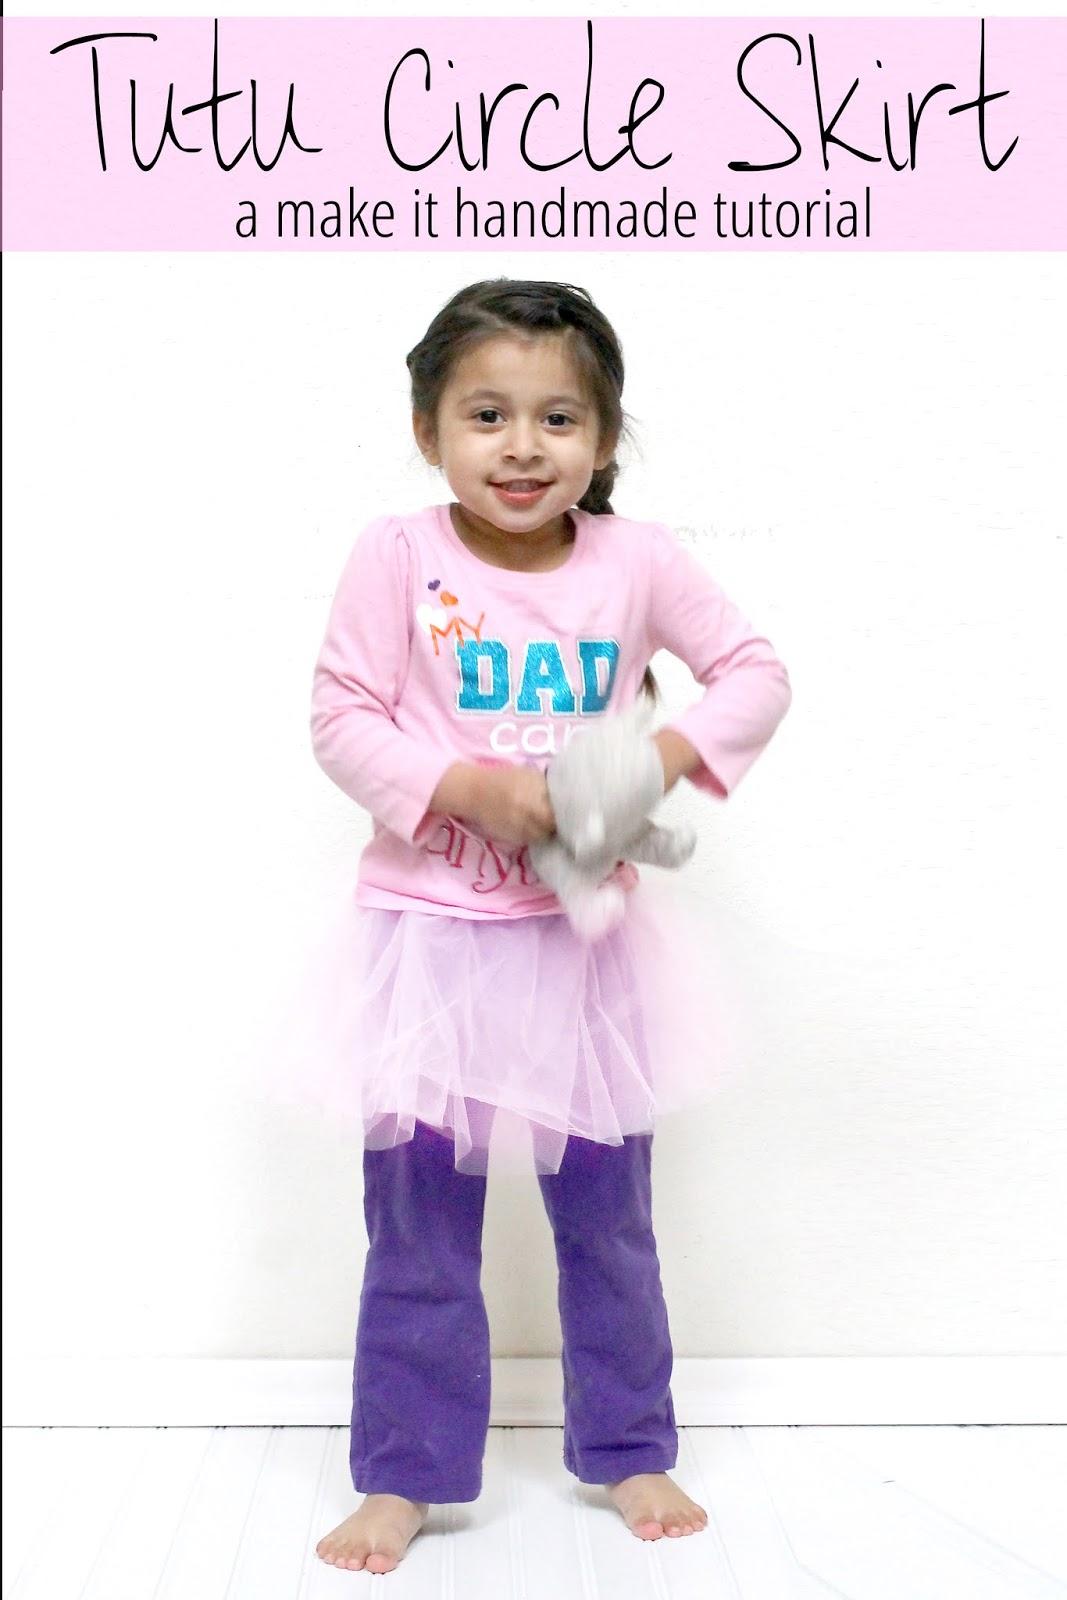 DIY Tutu sikrt-- perfect for fairies, ballerinas, and princesses.